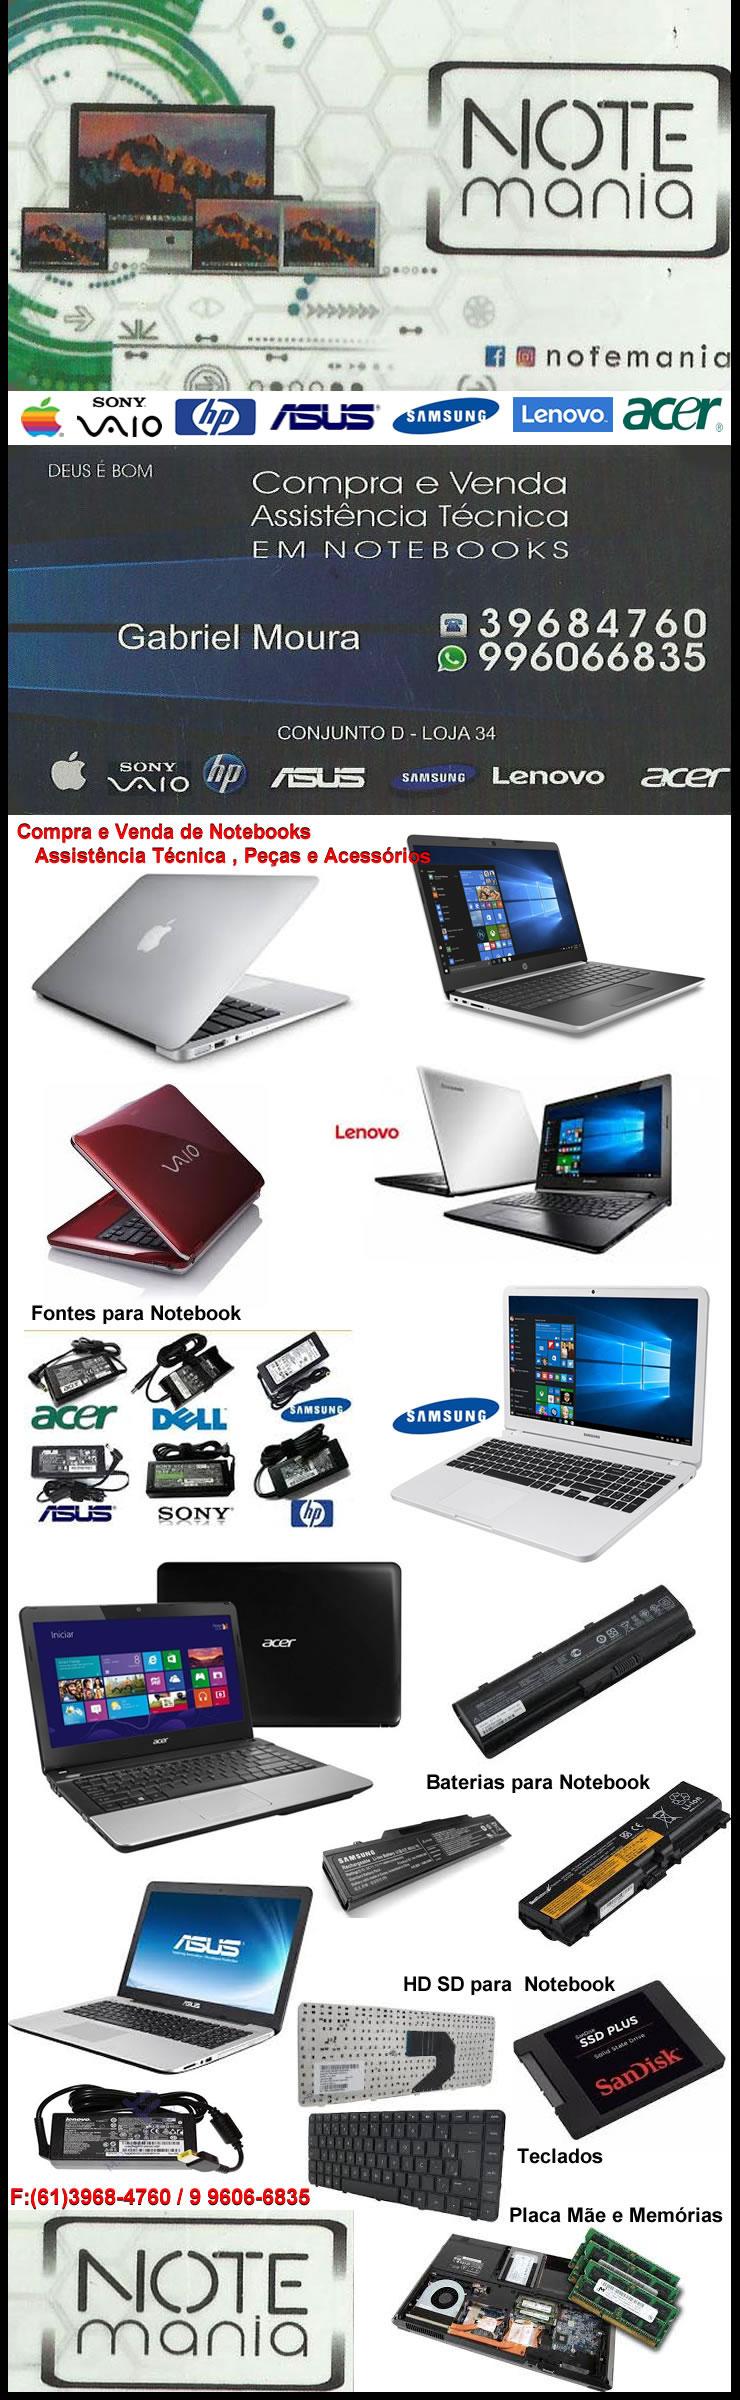 Base_Note_Mania Notemania _ Assistência a Notebooks